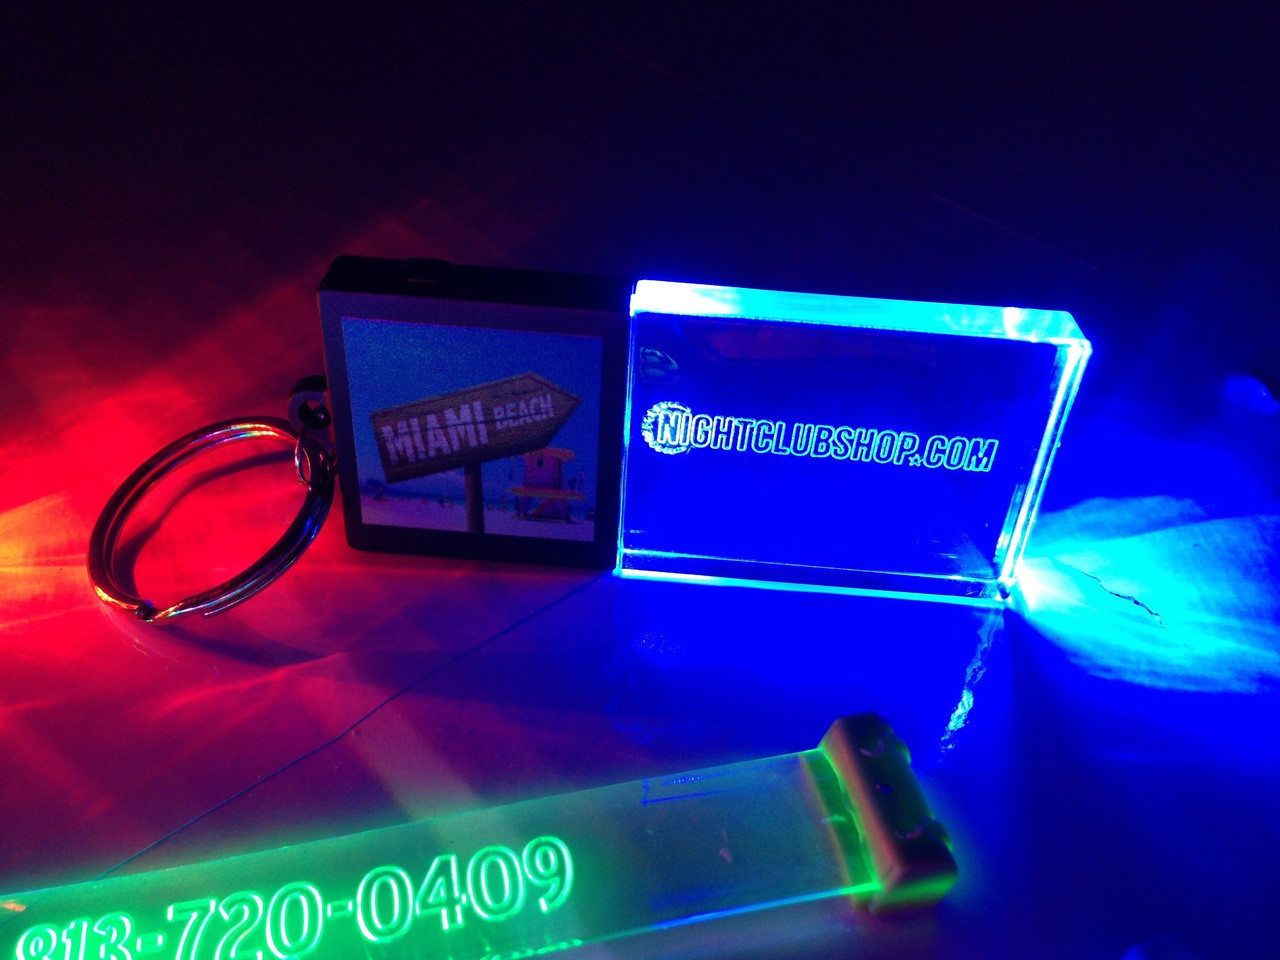 LED,Keychain,Key,chain,LED keychain, custom, BEAM, dual, print,engraved, logo,text, laser engraved,personalized,promo,merch,fundraiser,nightclub,fund raiser,light up